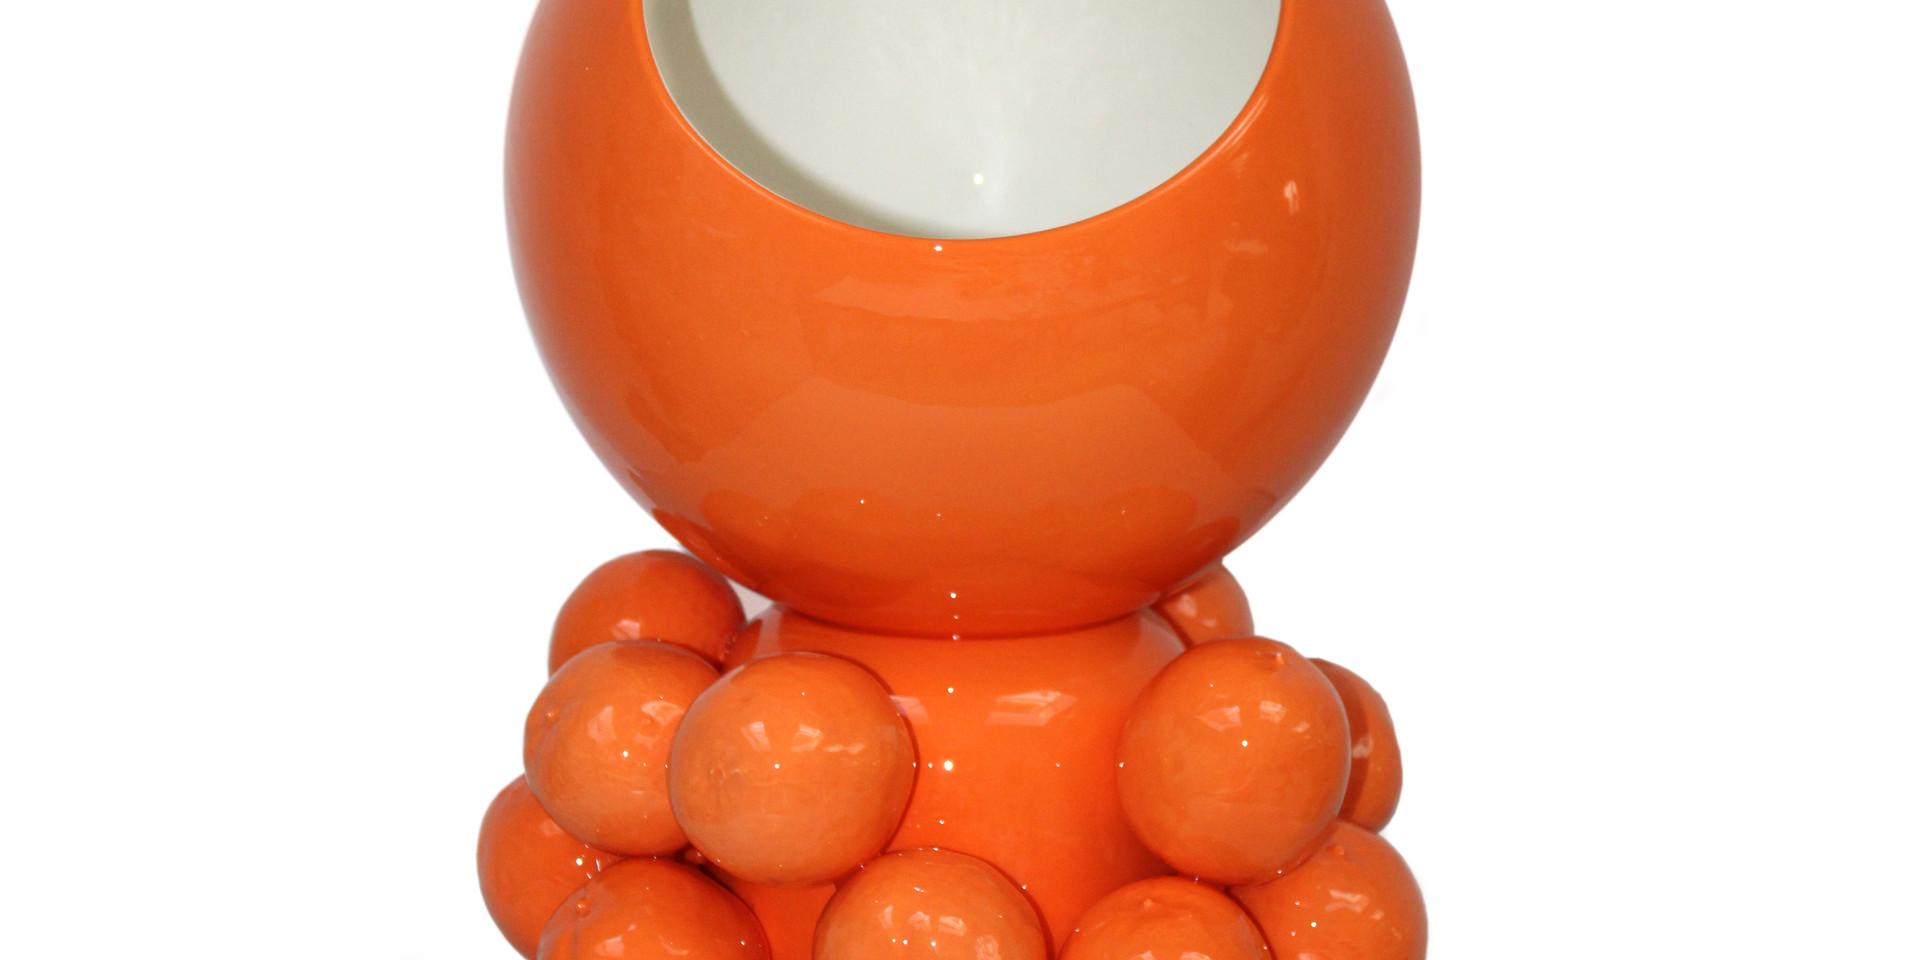 Tete d'Orange packshot.jpg